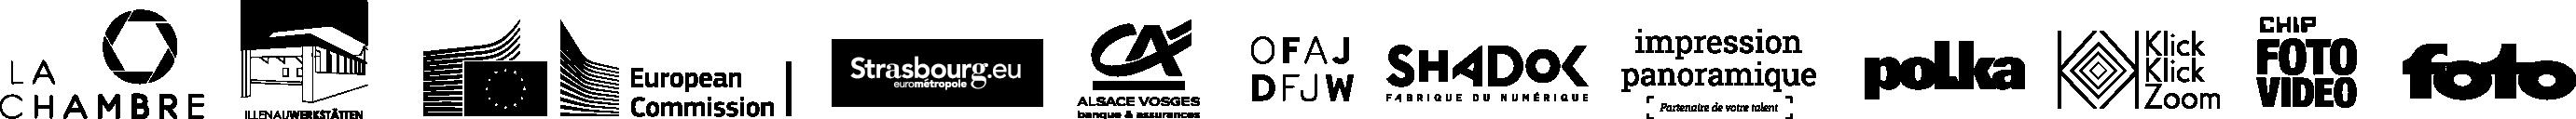 frise logos_clicclac17_OK